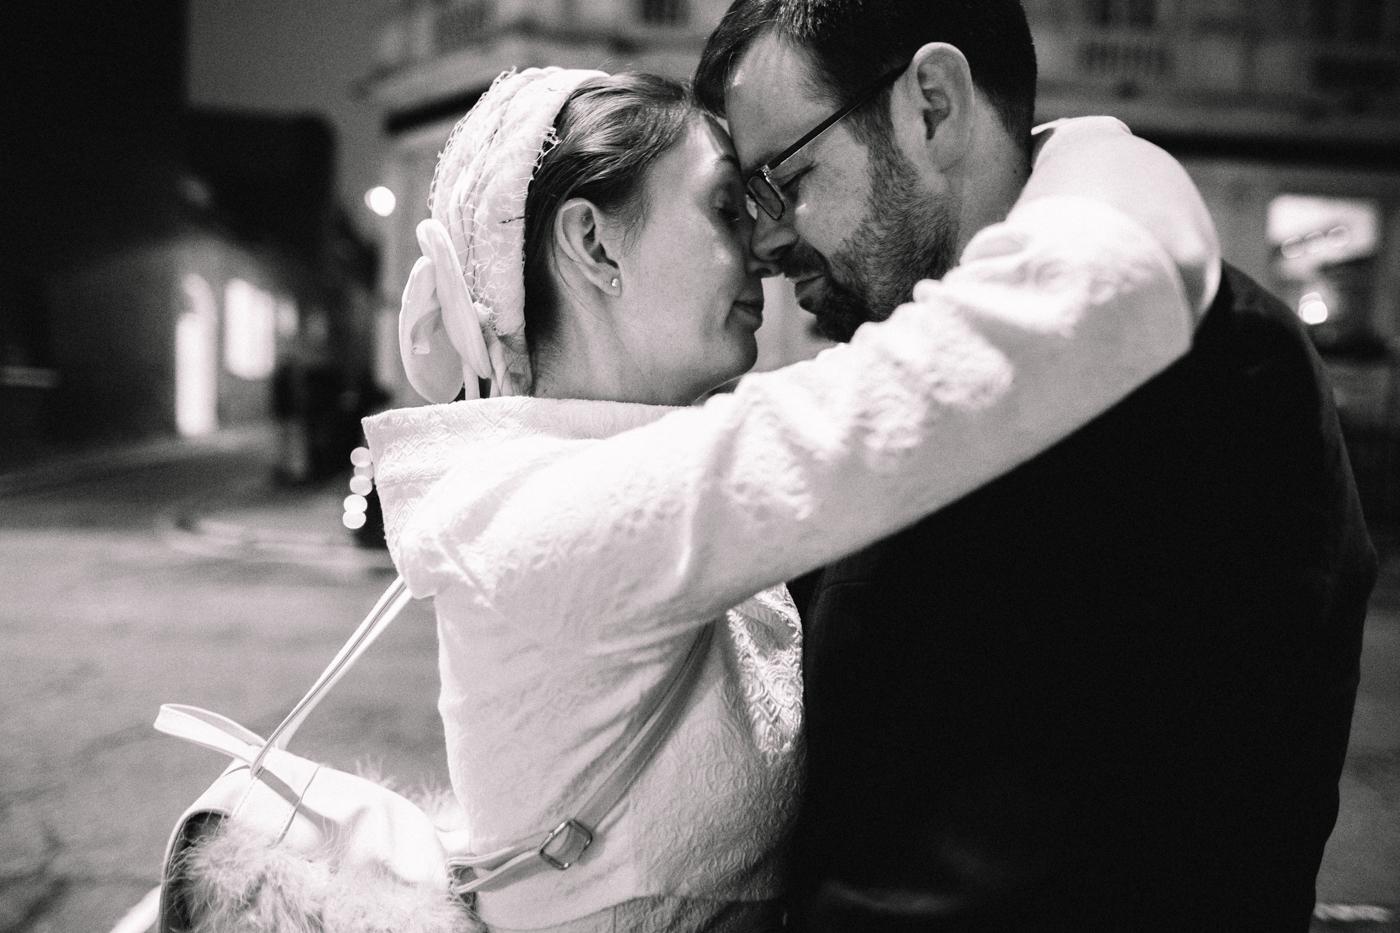 knights-templar-london-city-centre-wedding-photographer-charing-cross-creative-0036.jpg